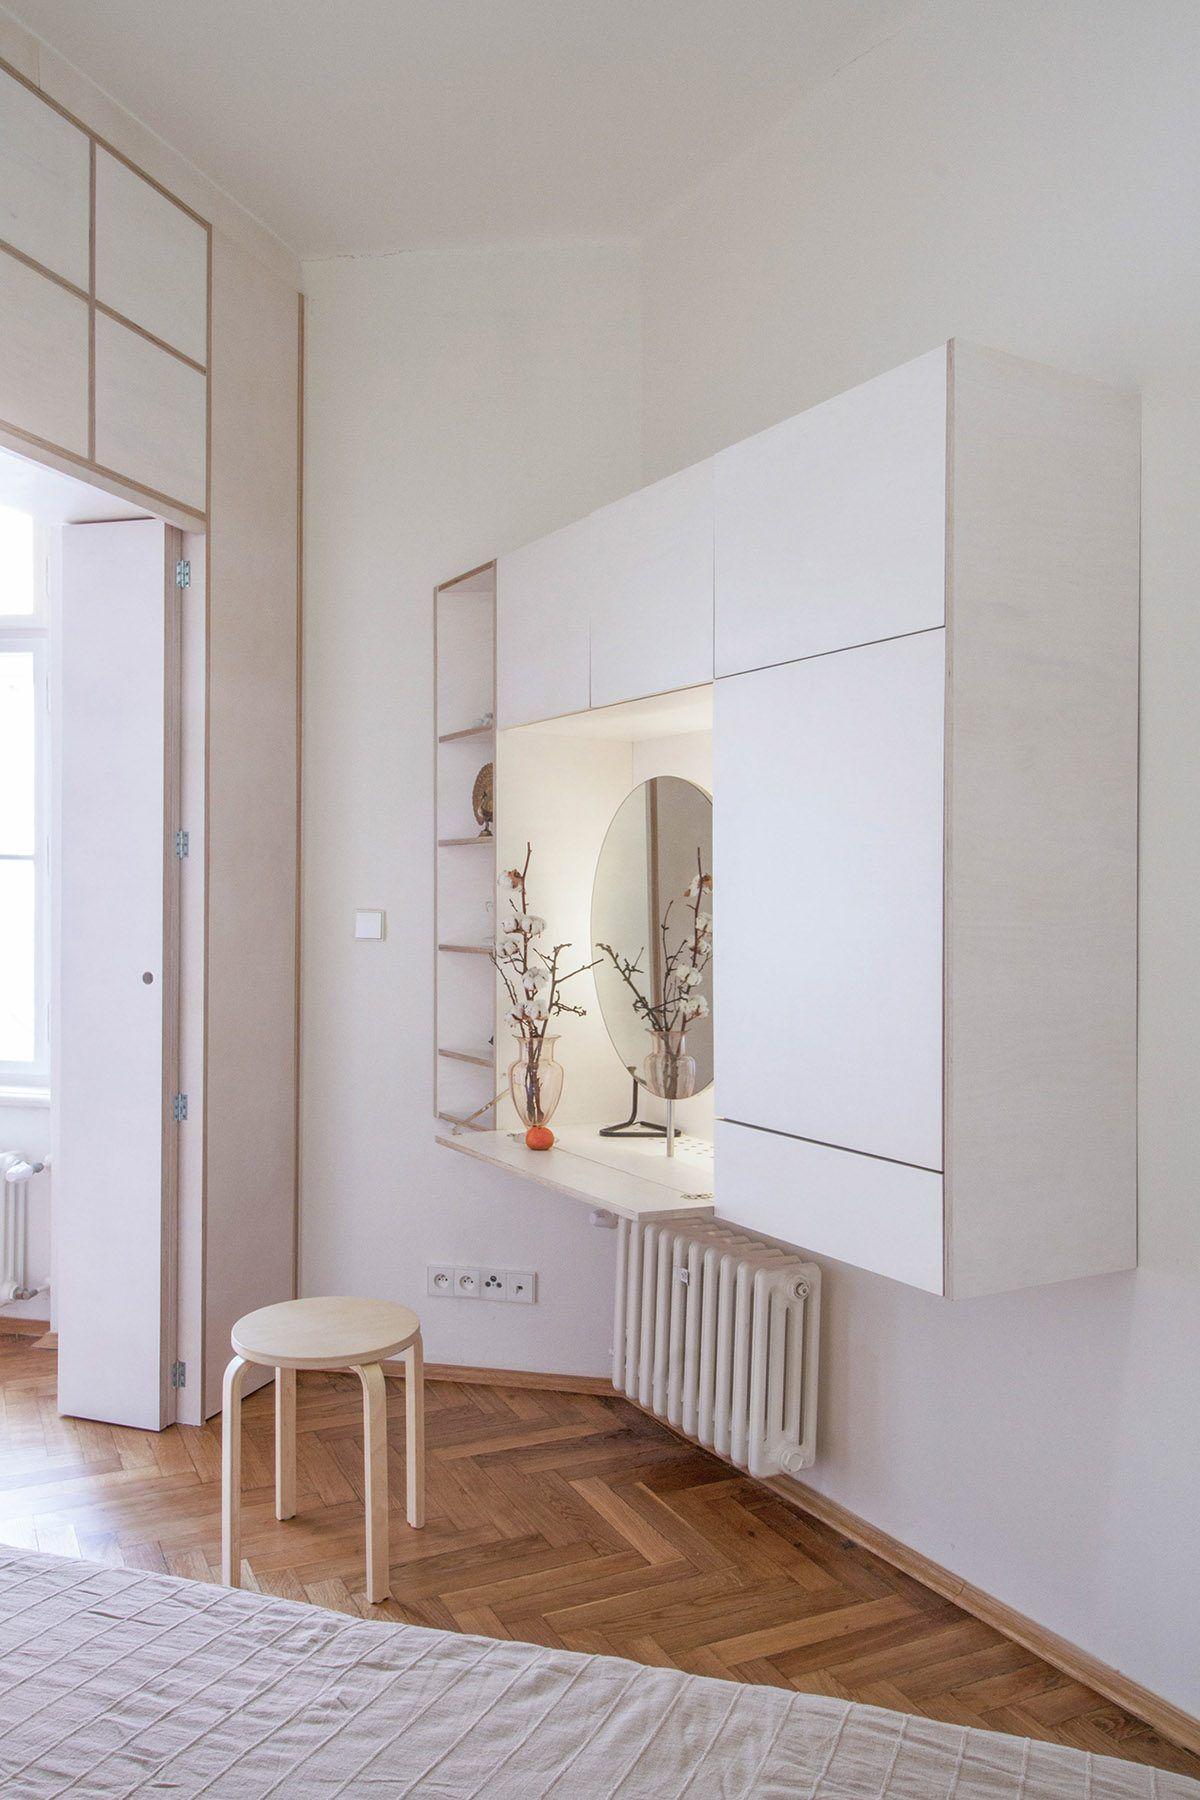 Industrial minimalist bedroom apartment therapy minimalist bedroom decor dressers minimalist home furniture black white minimalist home with kids decor